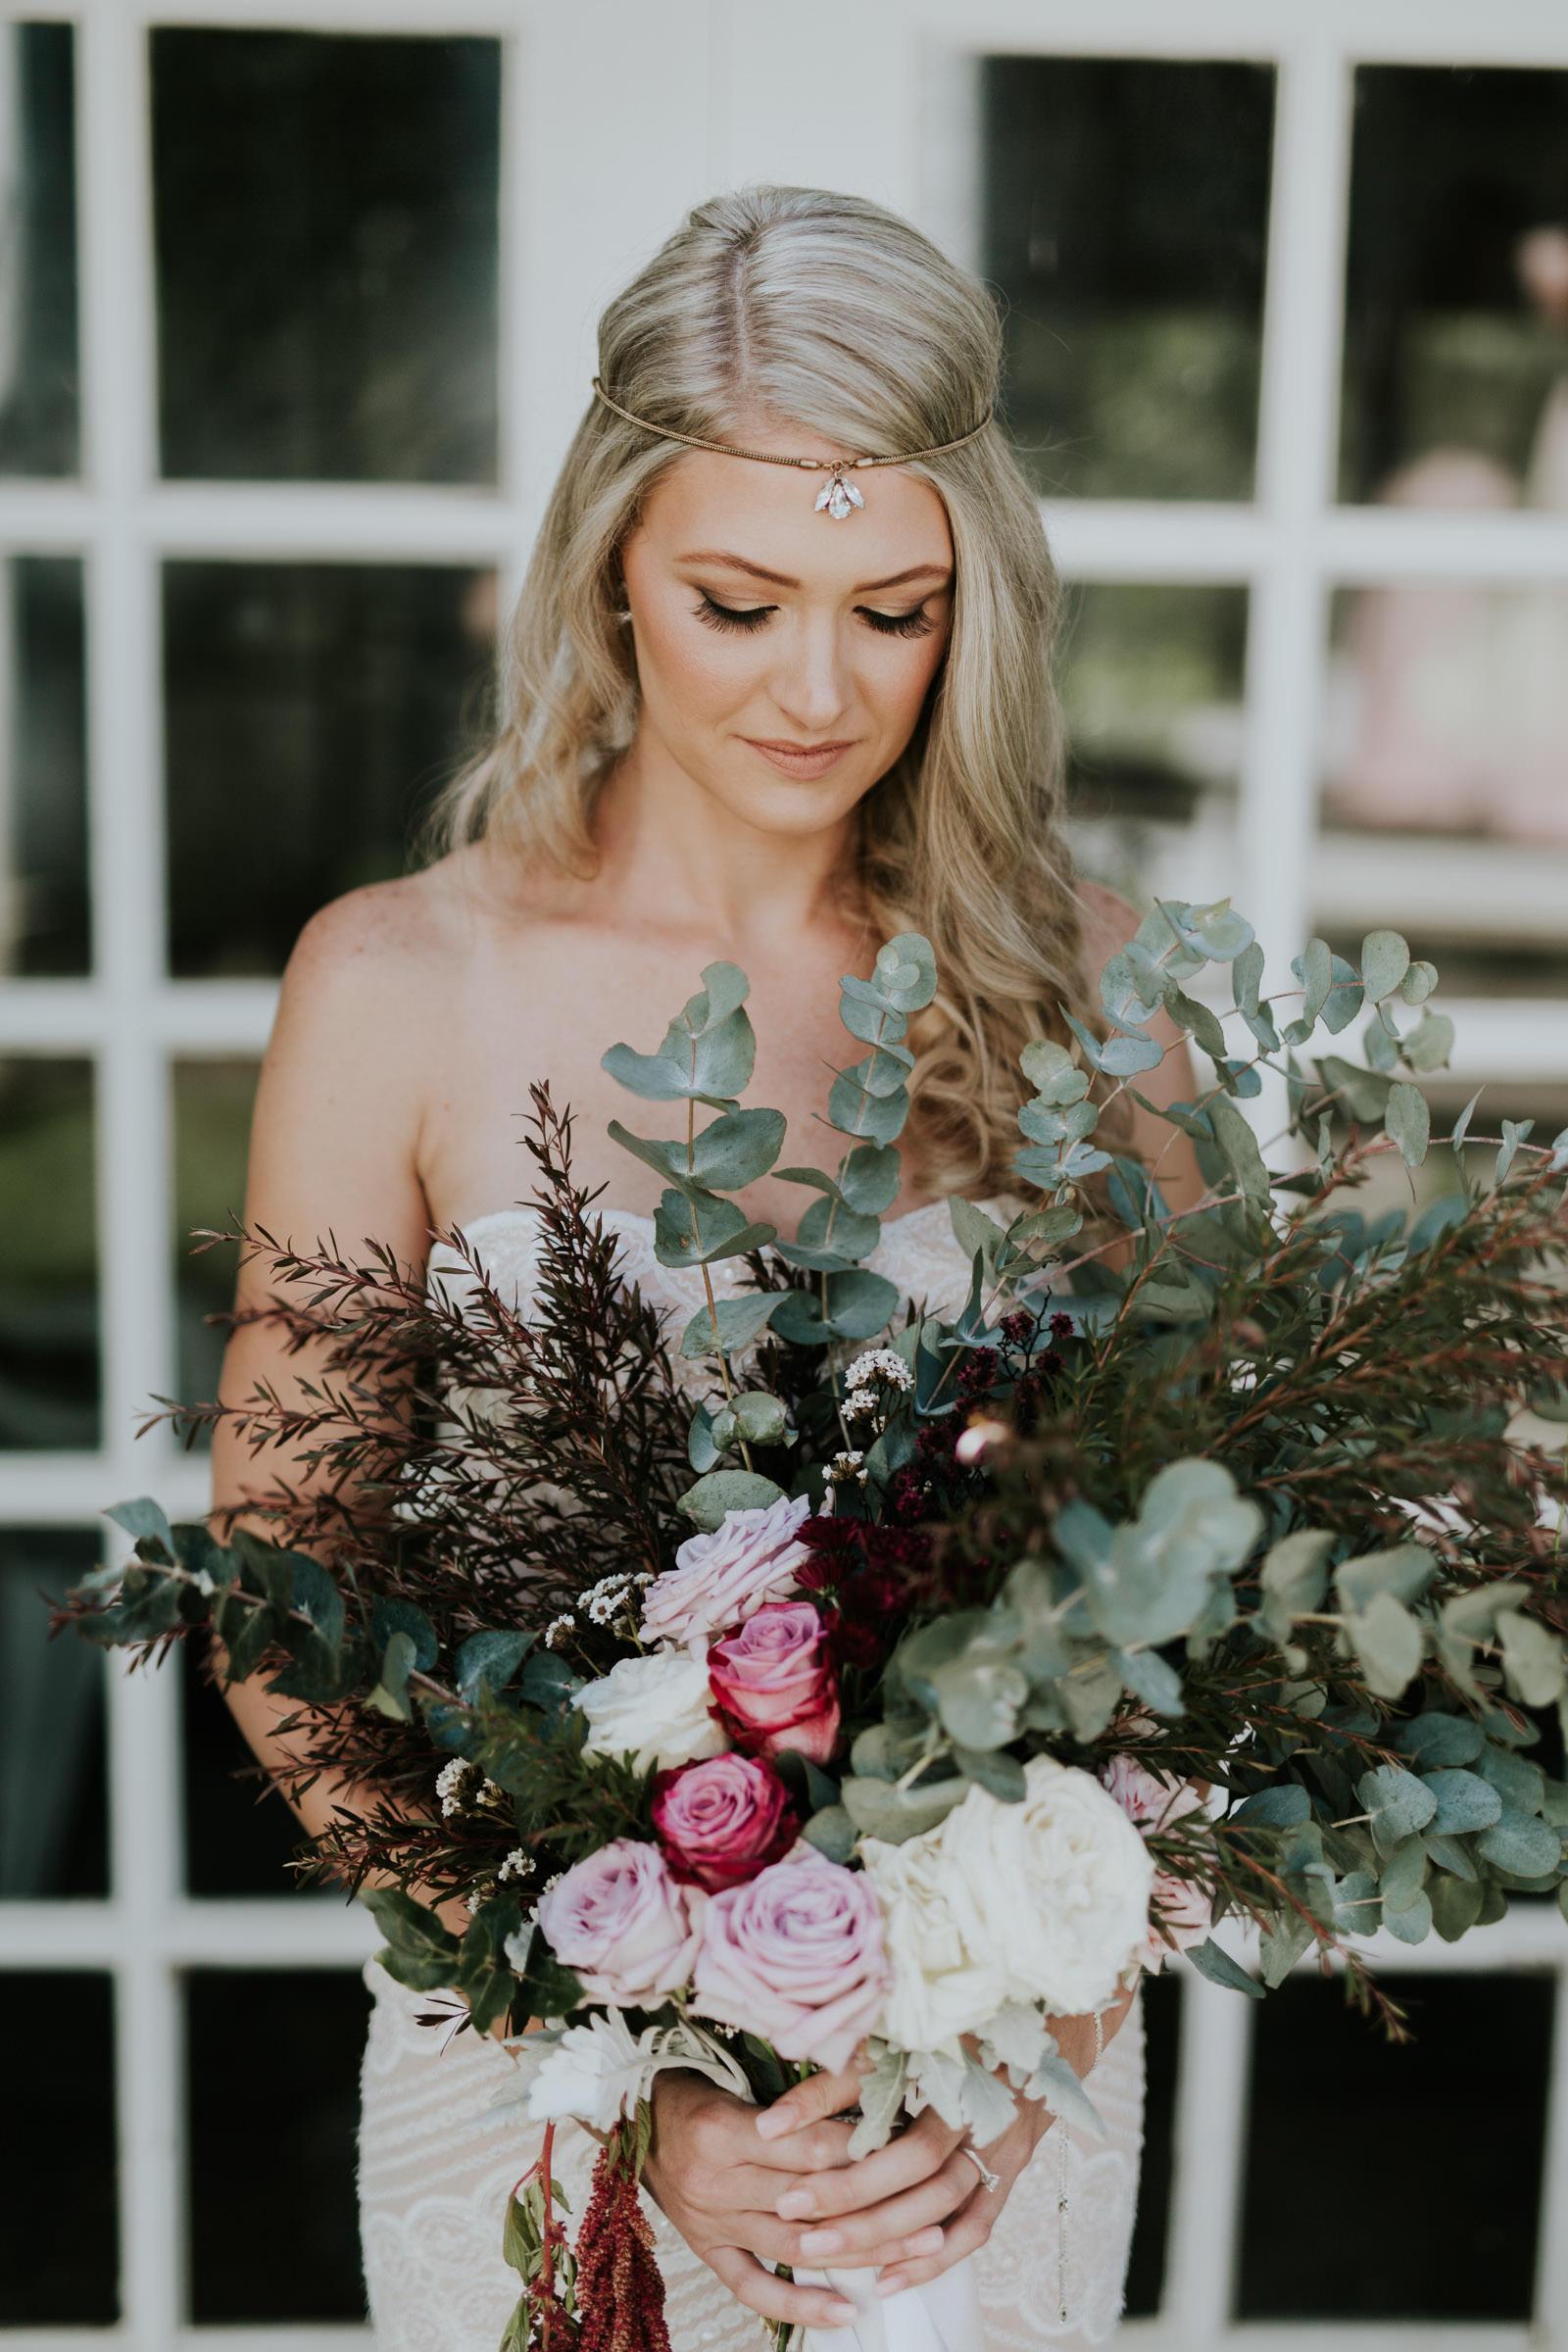 Emma+John+Far+South+Coast+Wedding+Festivl+Glamping+Bush-65.jpg